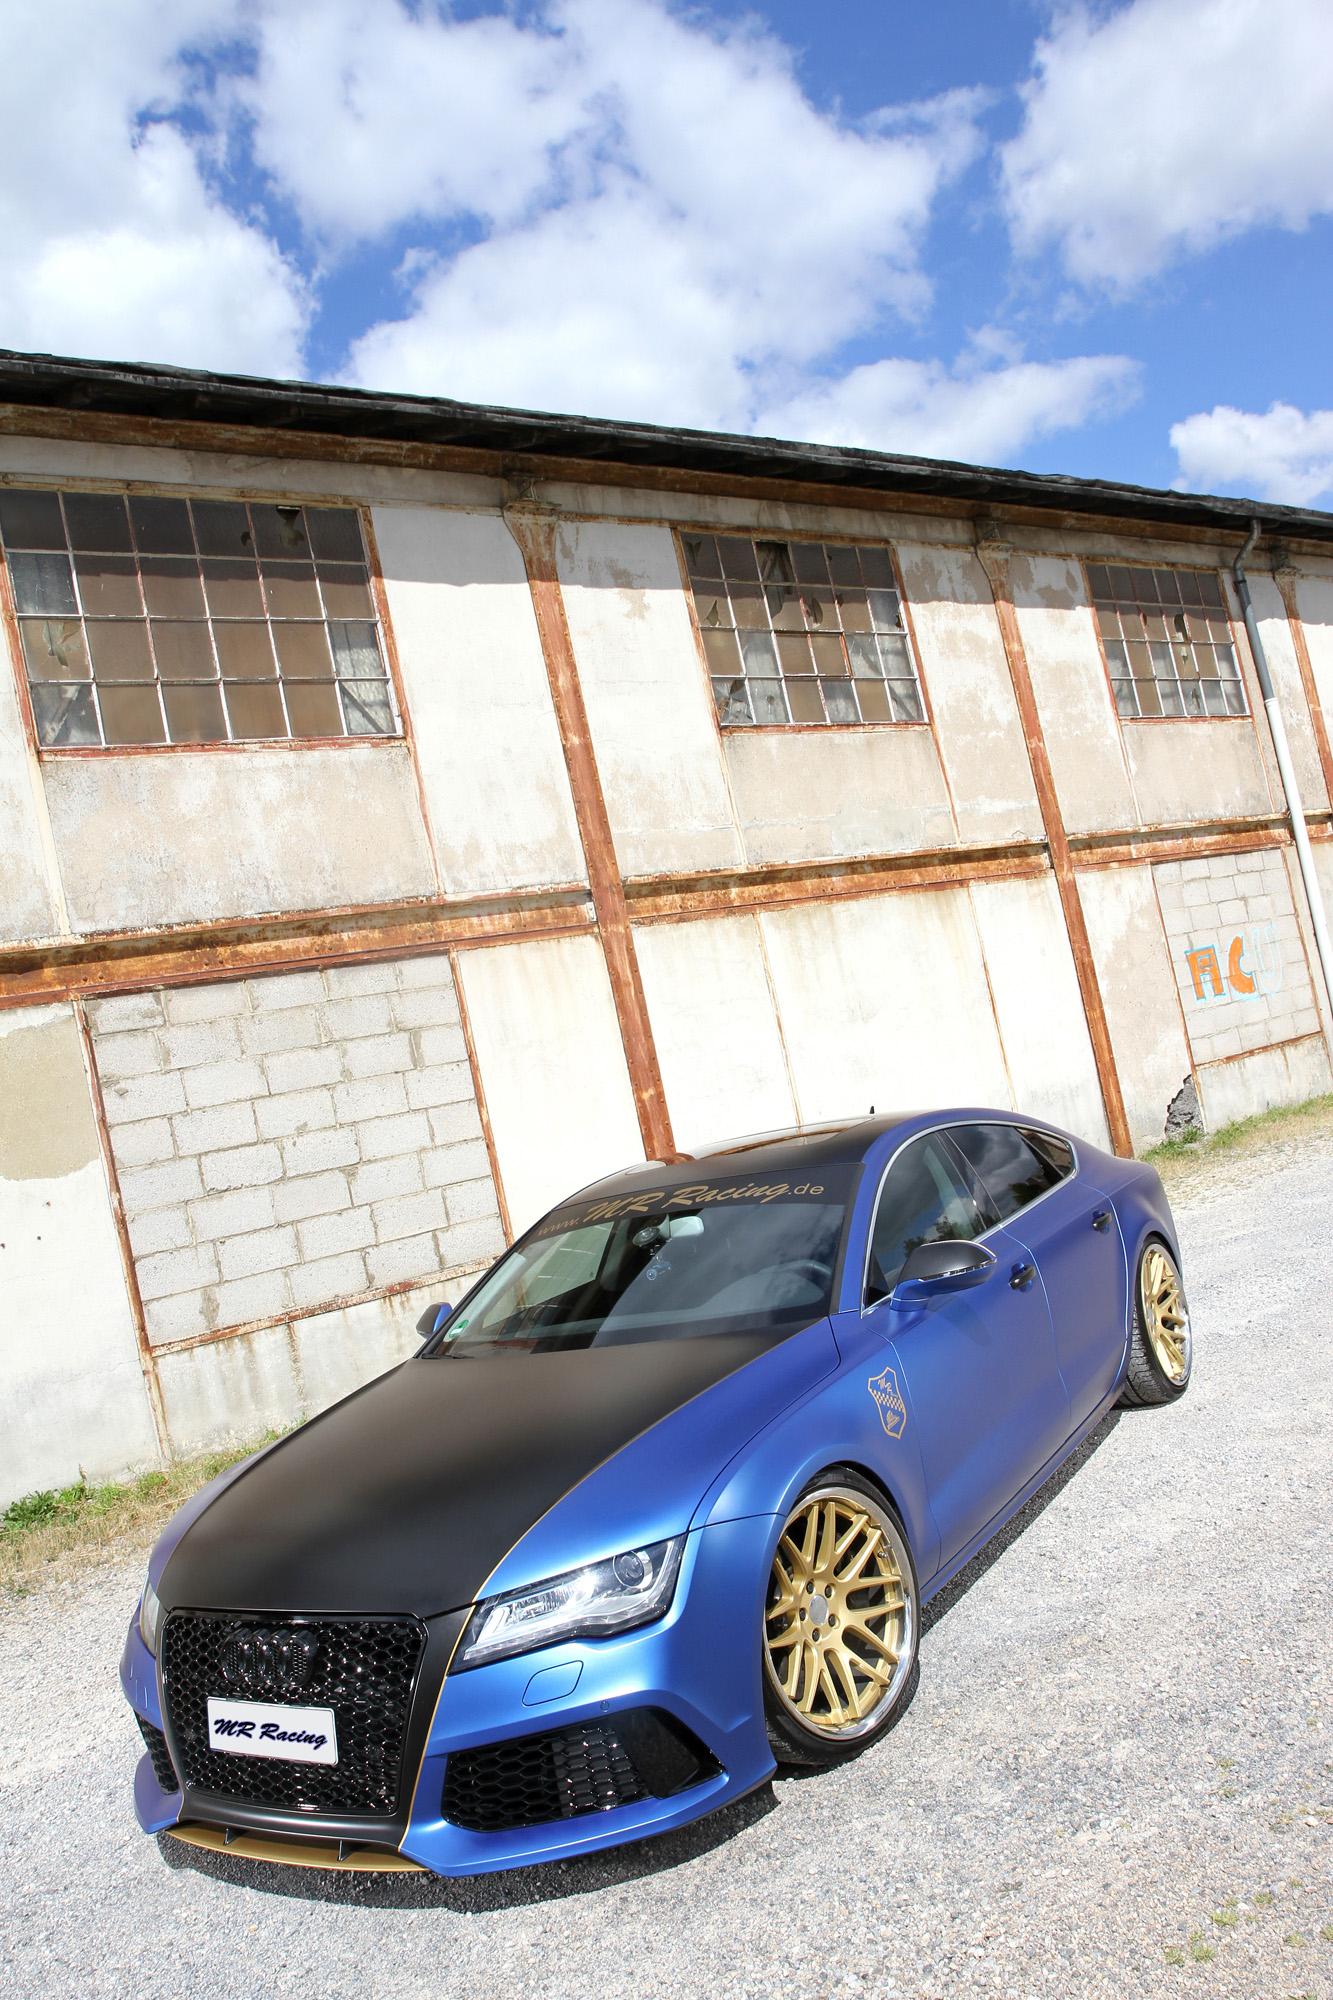 Markante Front des Audi A7 Sportback 3.0 TDI